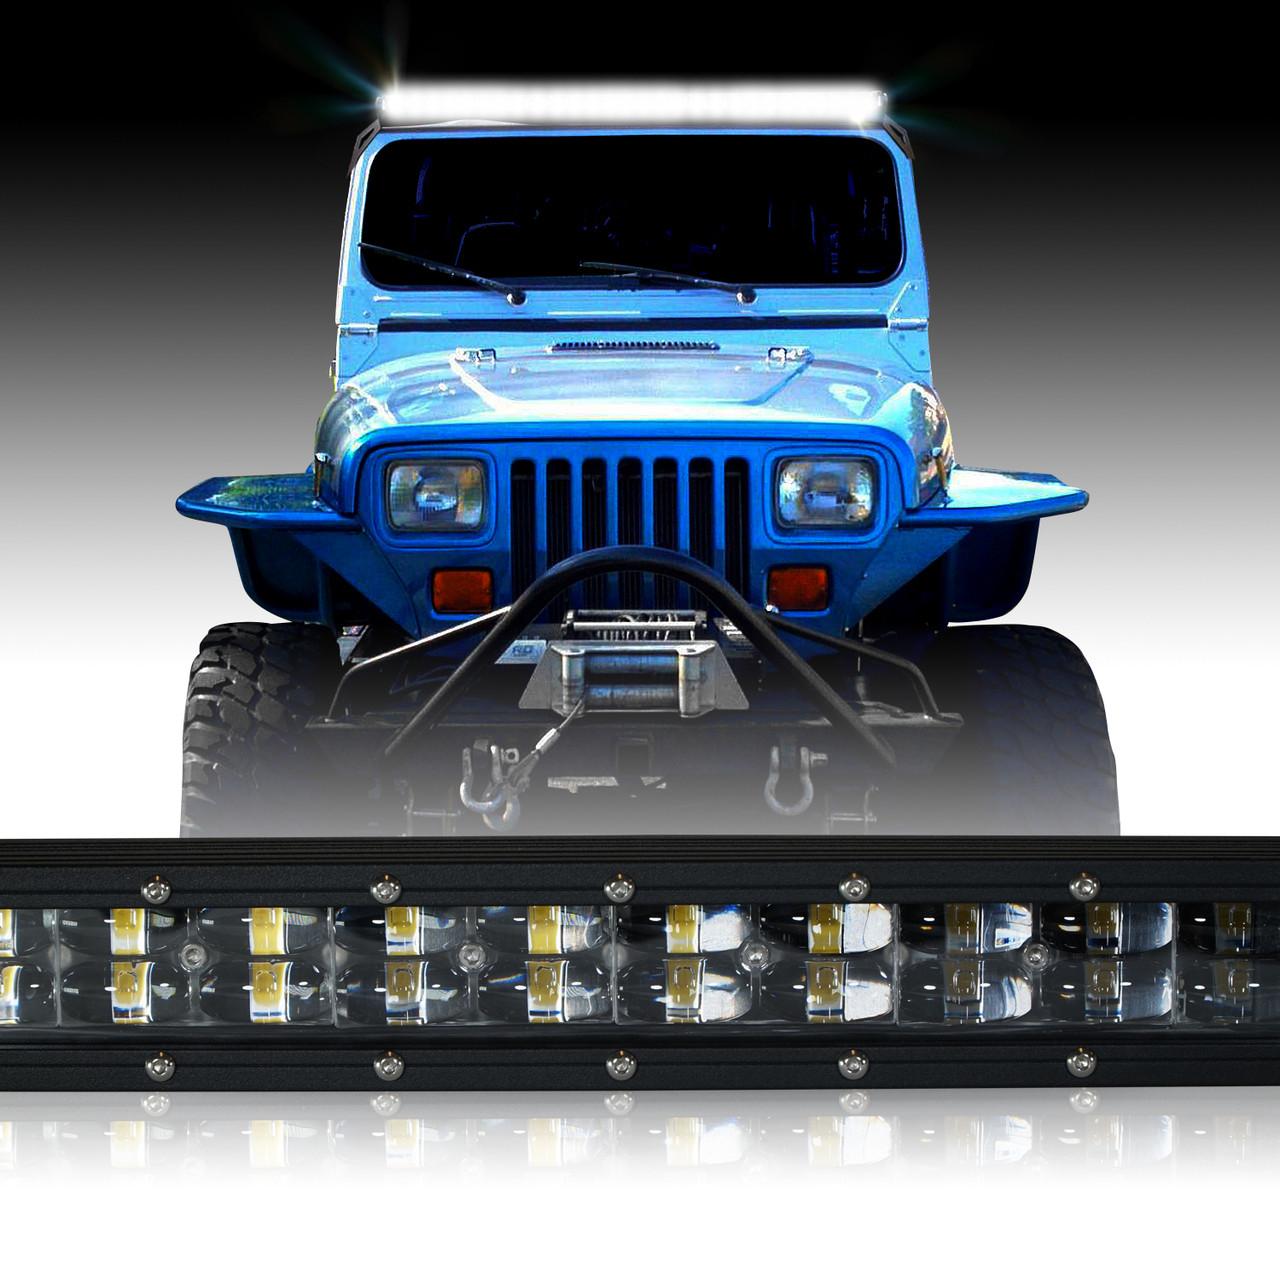 led light bar 288w 50 inches bracket wiring harness kit for wrangler 1987 jeep yj wiring diagram led light bar 288w 50 inches bracket wiring harness kit for wrangler yj 1987 1995